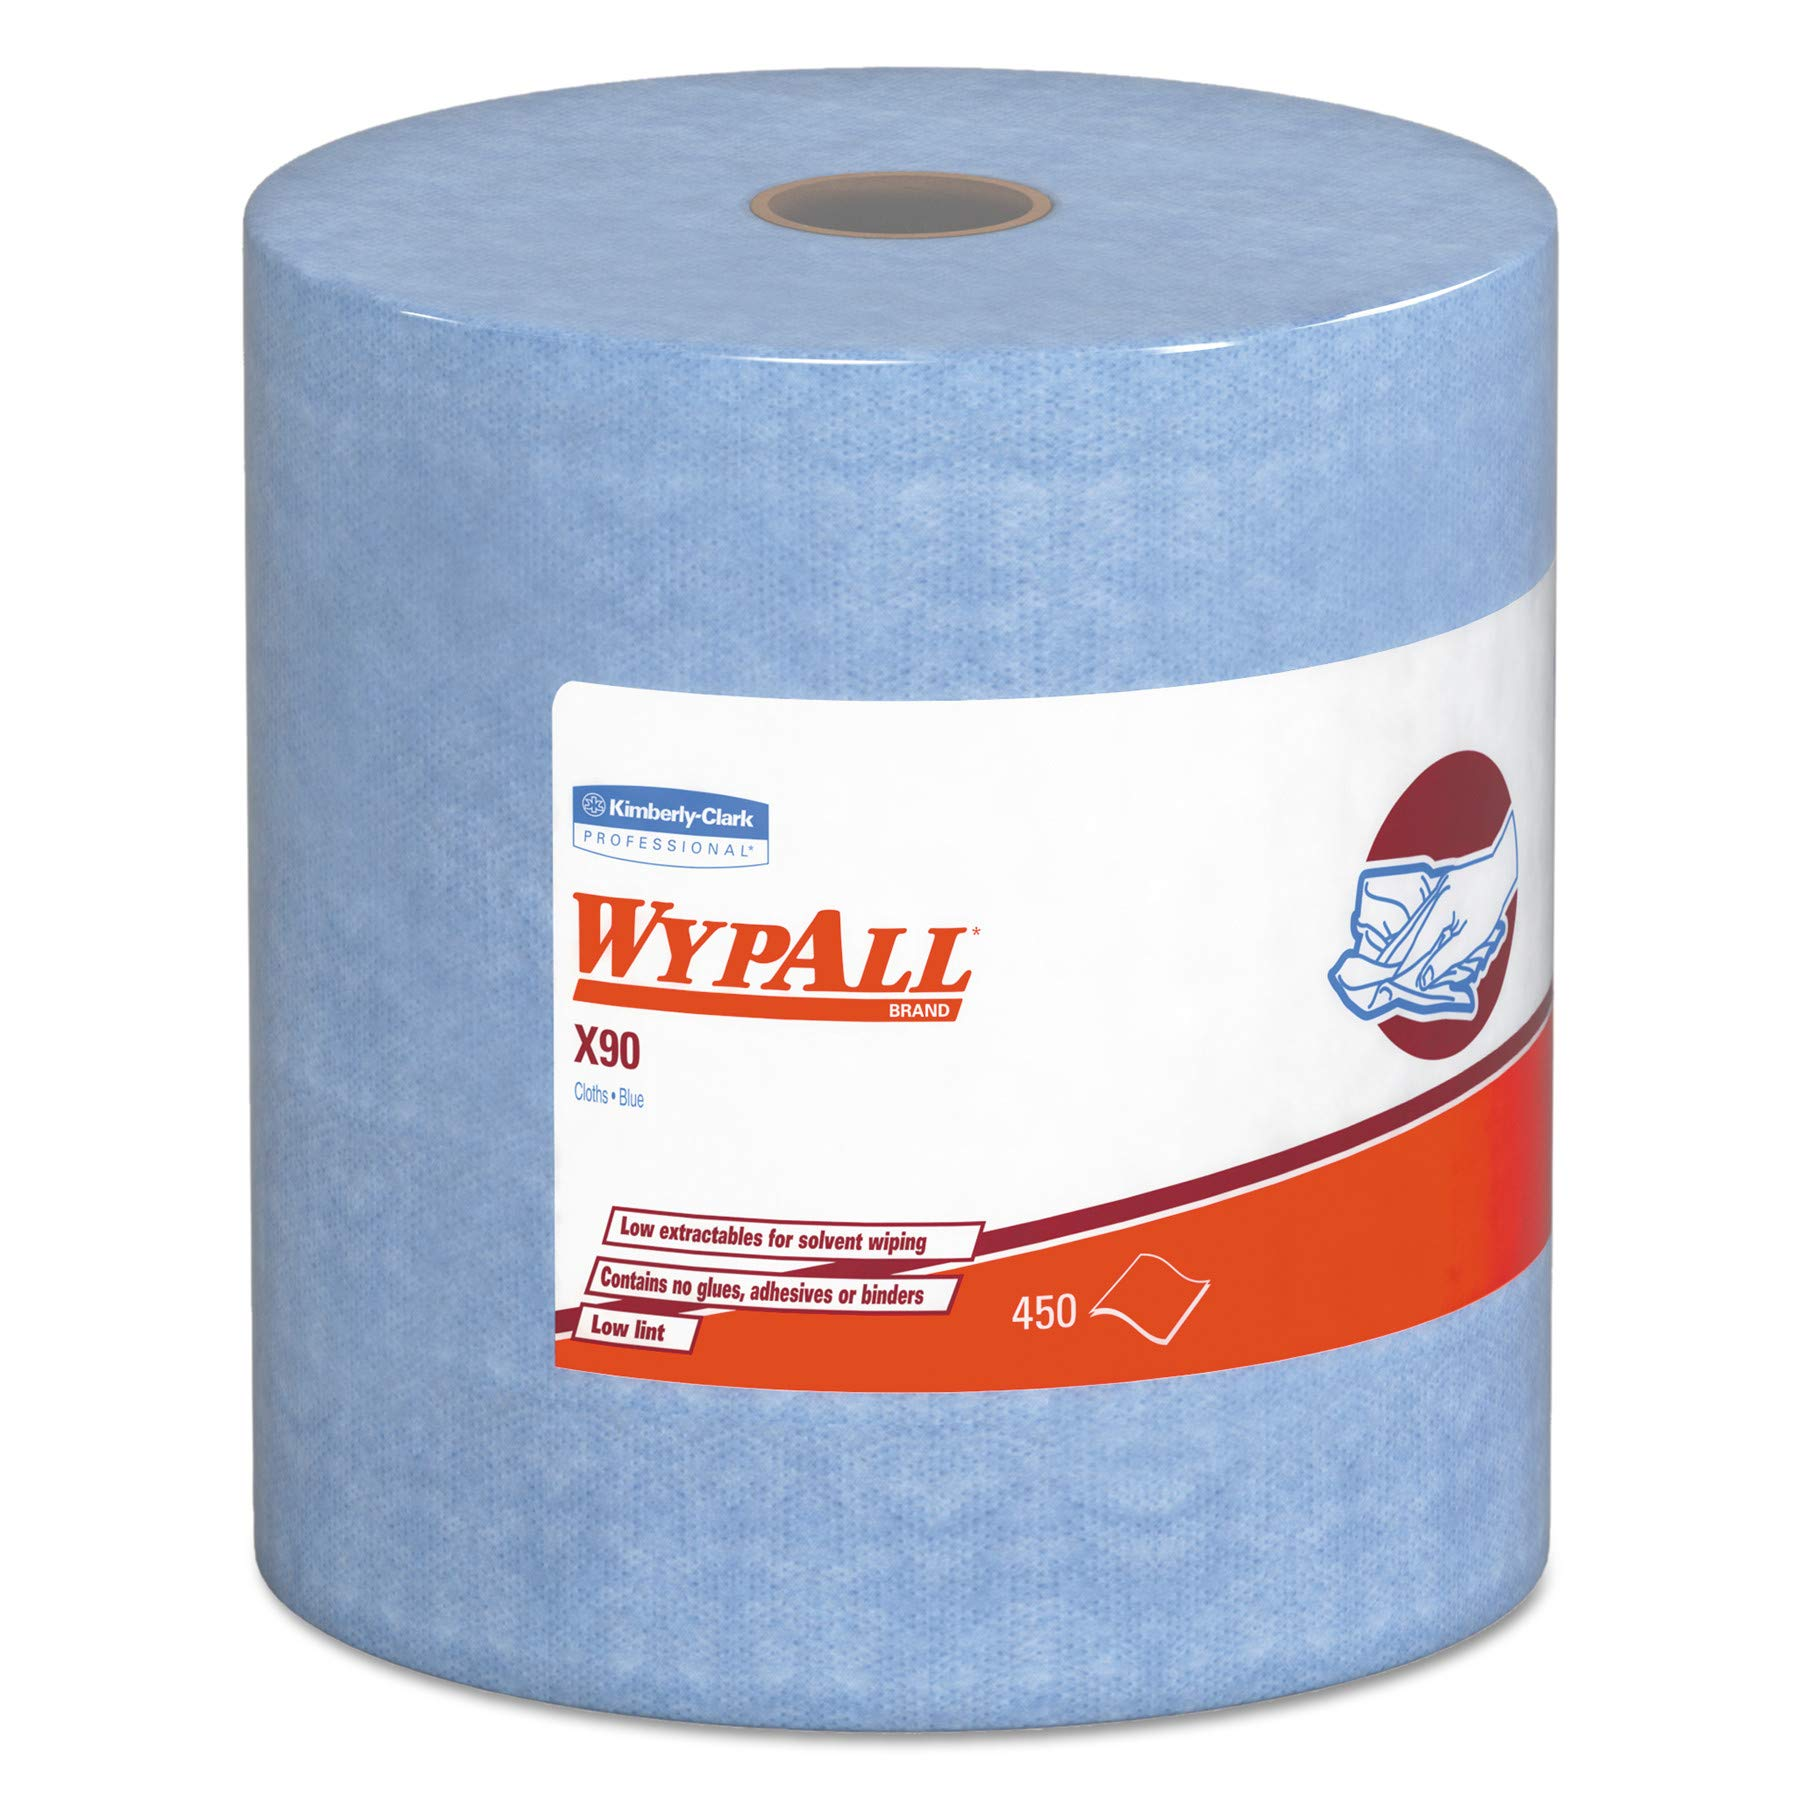 WypAll 12889 X90 Cloths, Jumbo Roll, 11 1/10 x 13 2/5, Denim Blue, 450/Roll, 1 Roll/Carton by Wypall